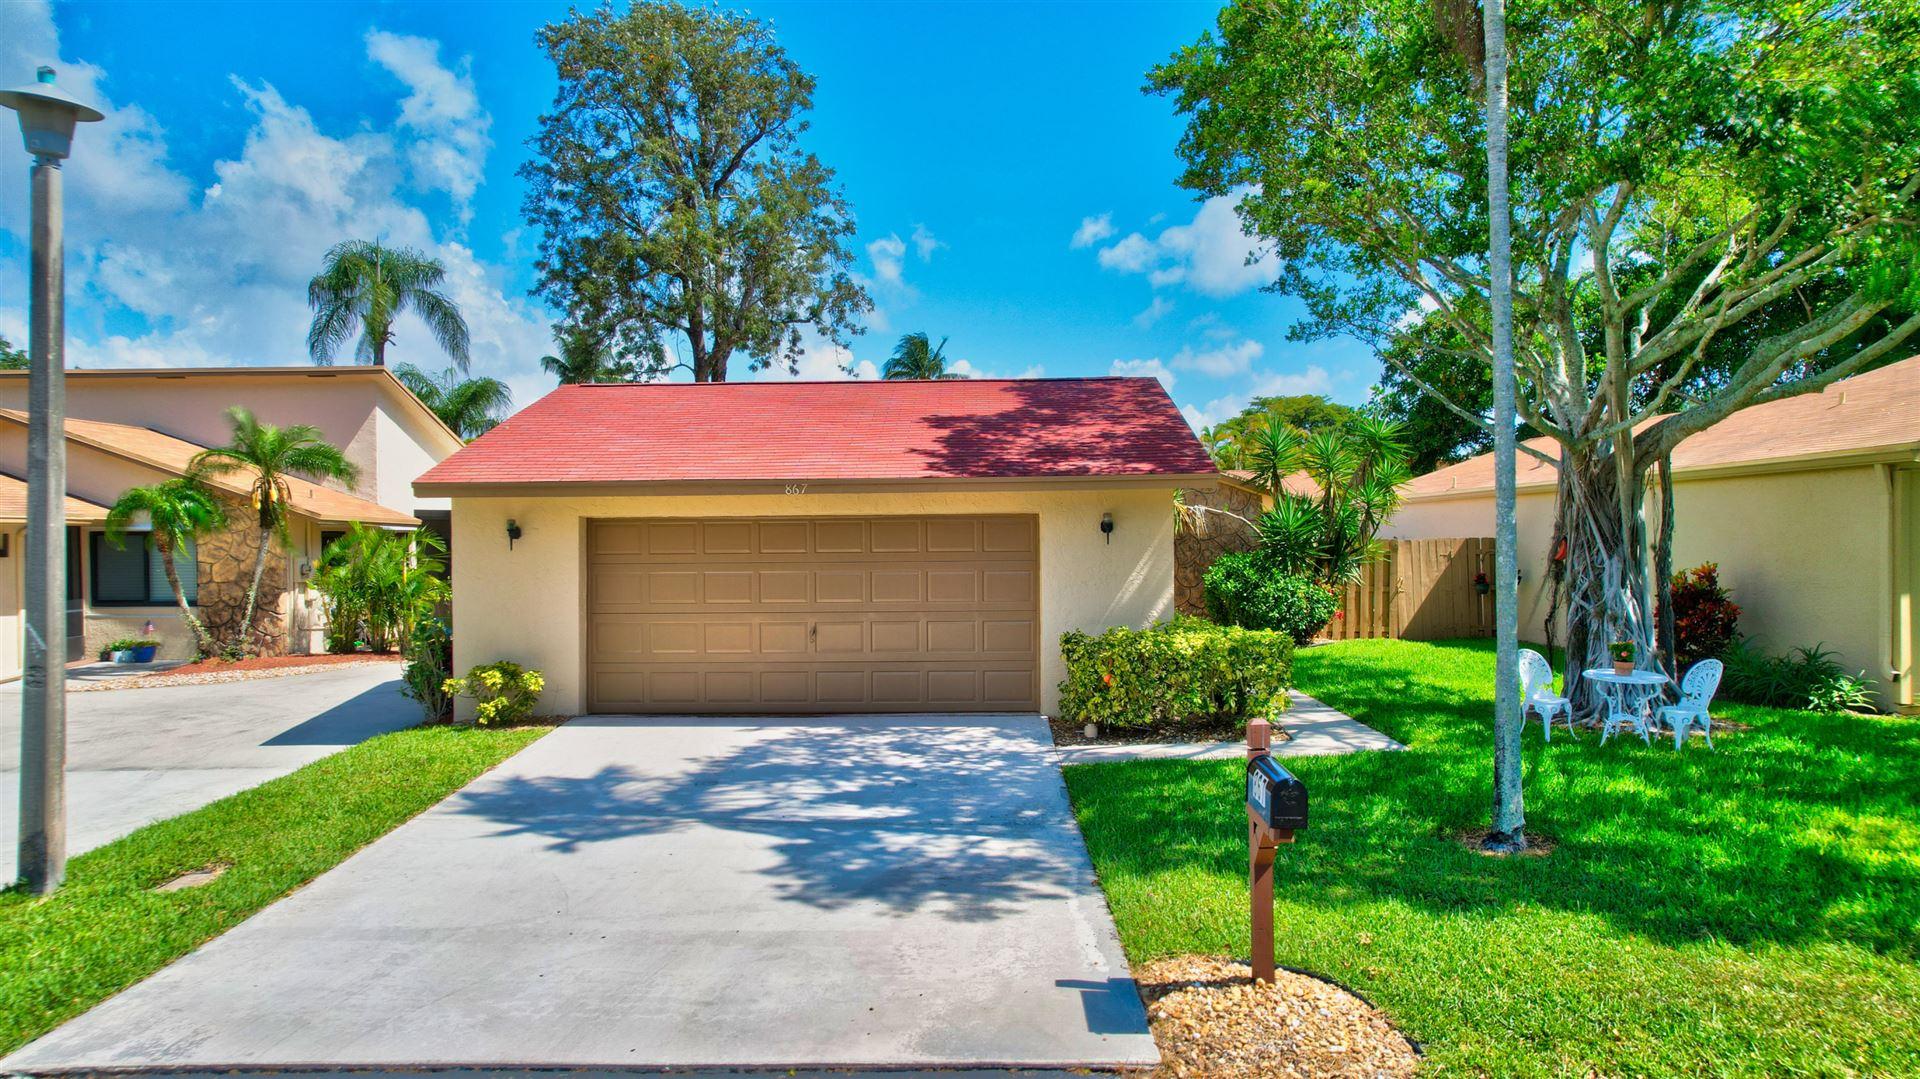 867 NW 25th Avenue, Delray Beach, FL 33445 - MLS#: RX-10714320